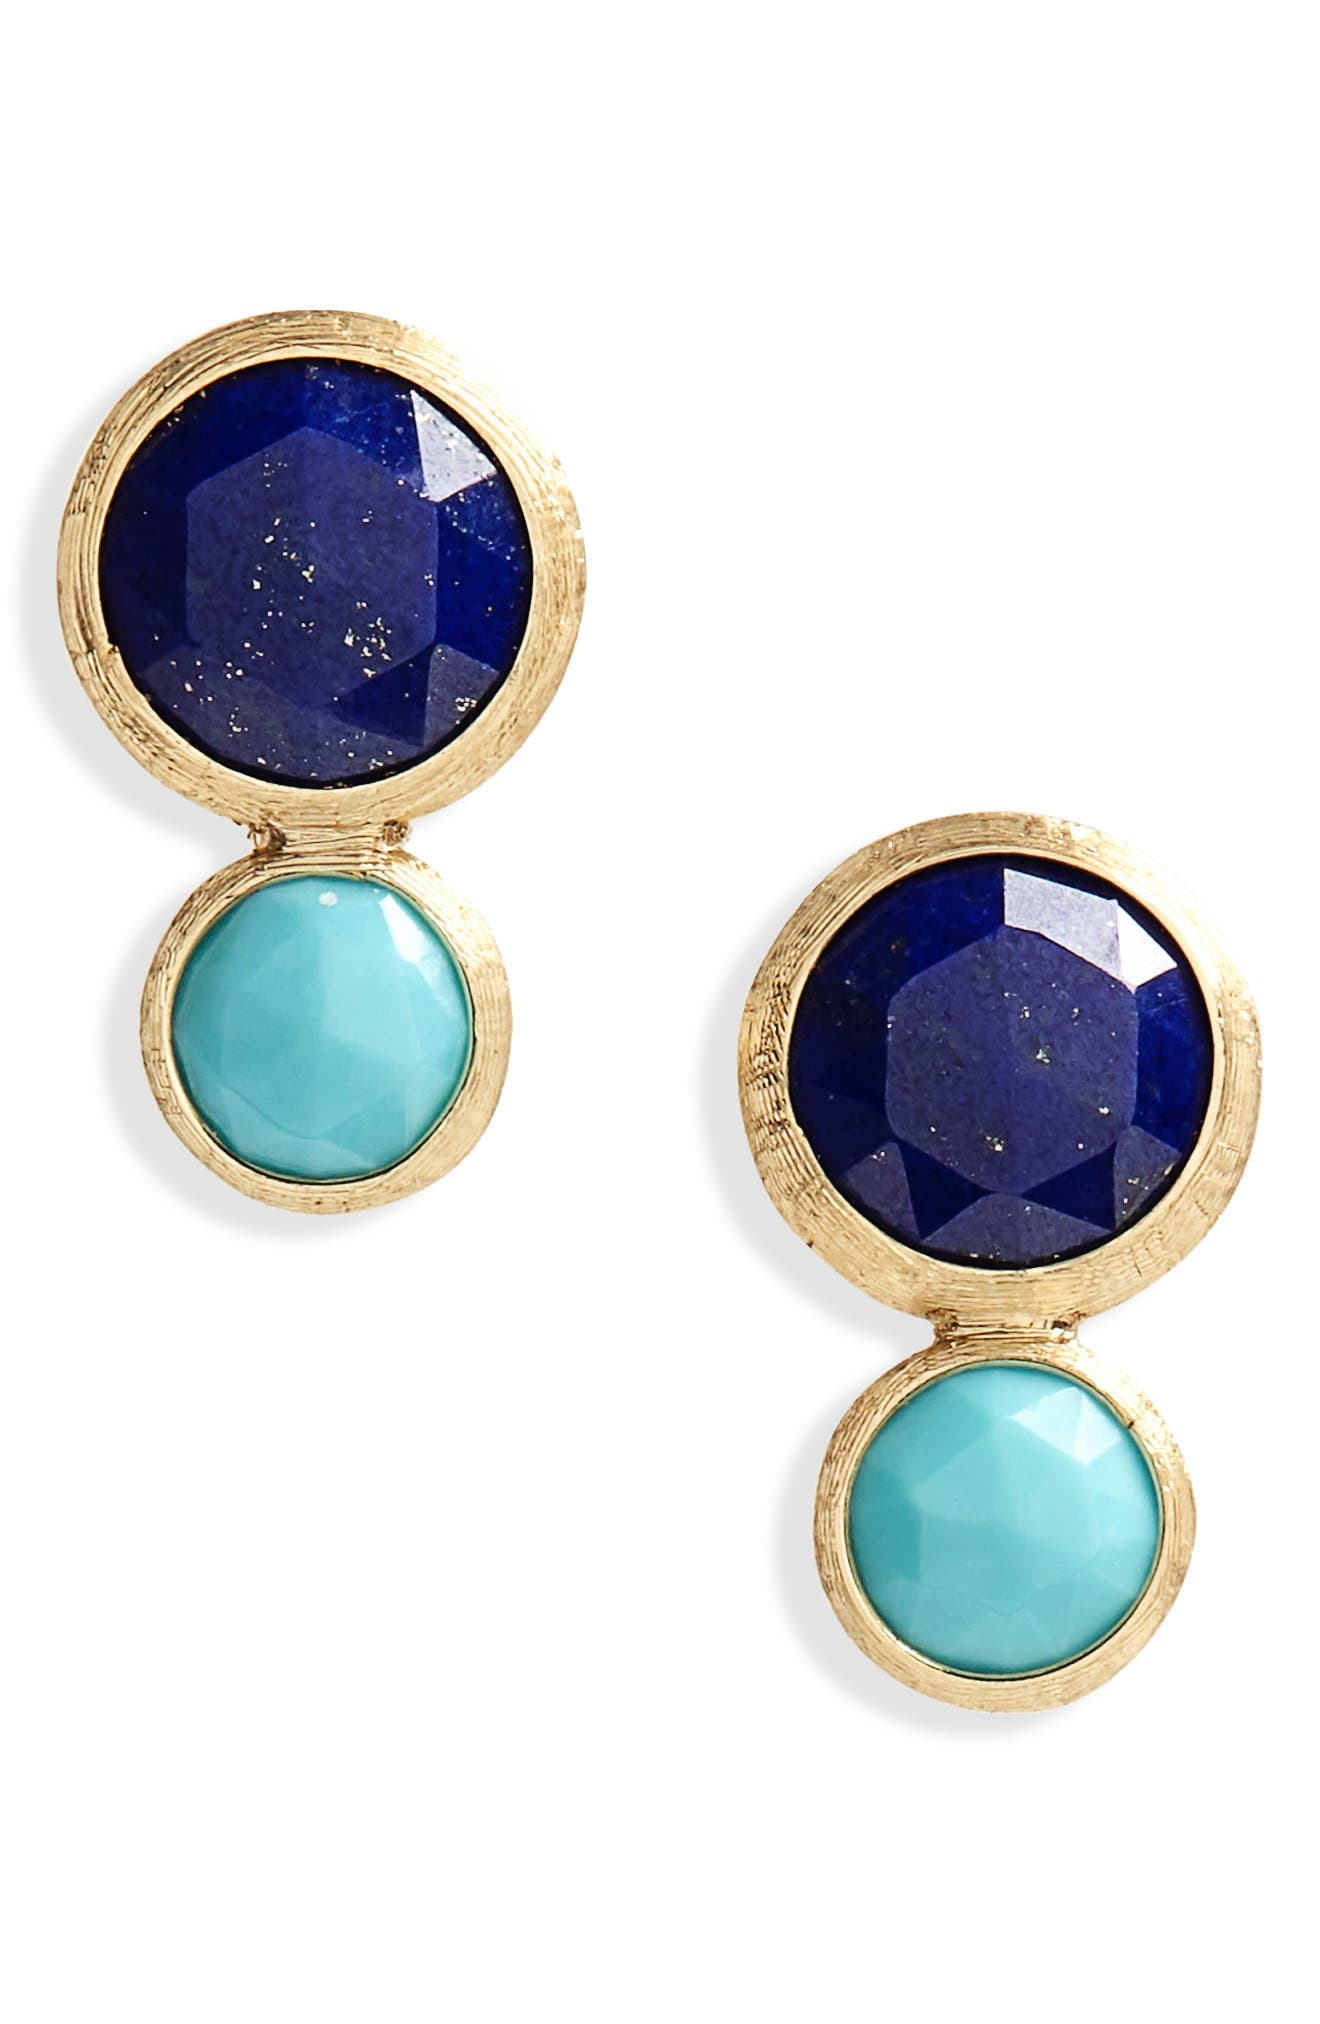 Jaipur Lapis & Turquoise Stud Earrings,                             Main thumbnail 1, color,                             Yellow Gold Lapis/ Turquoise